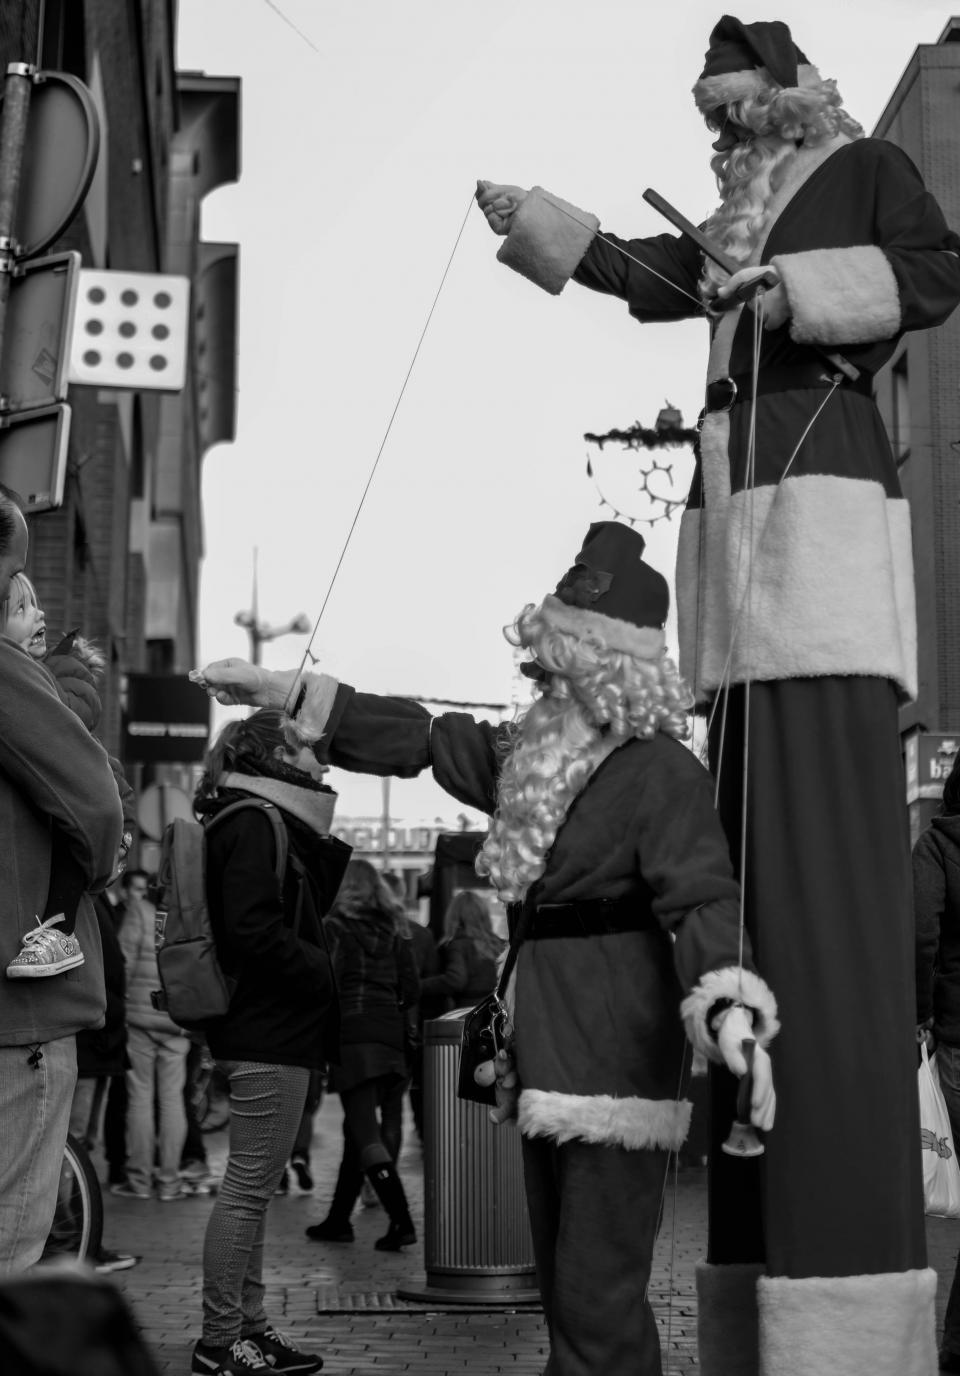 santas, marionettes, stilts, festival, parade, party, street, spectators, people, crowd, christmas